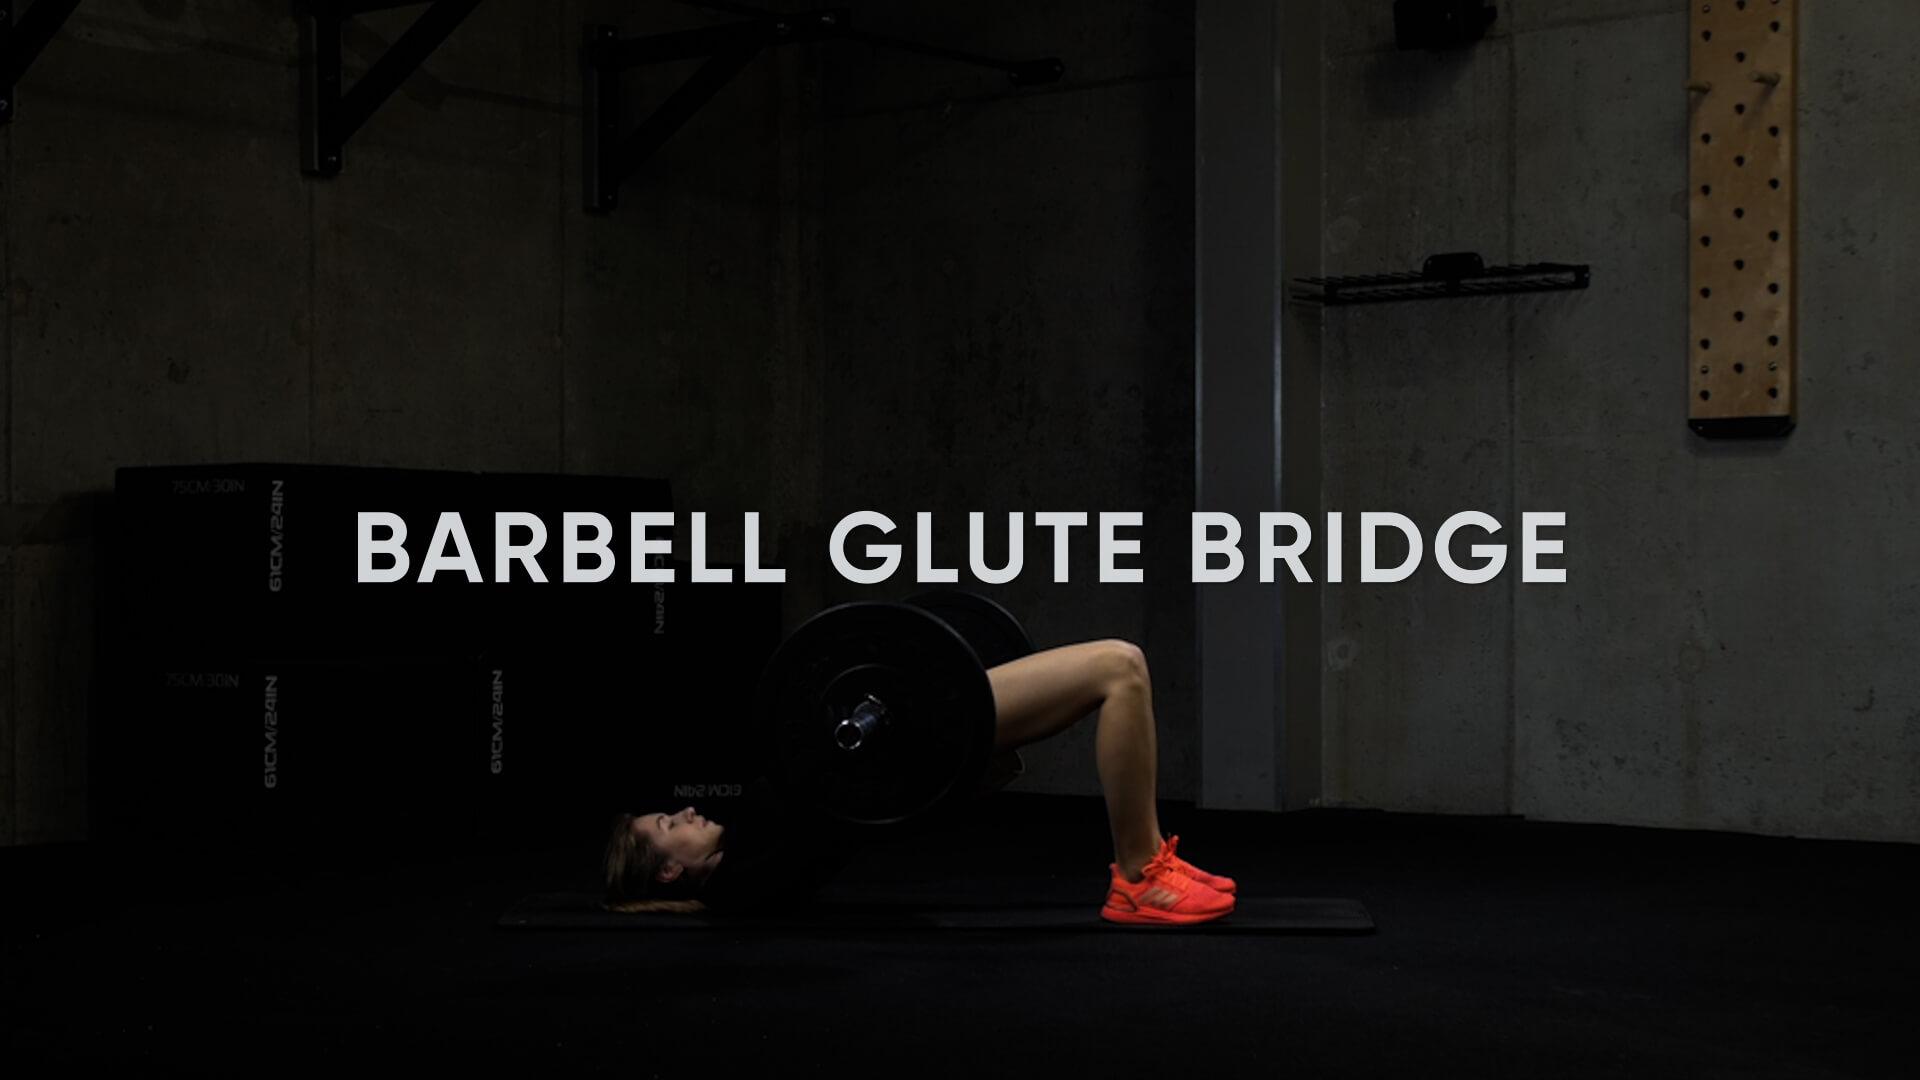 Barbell Glute Bridge